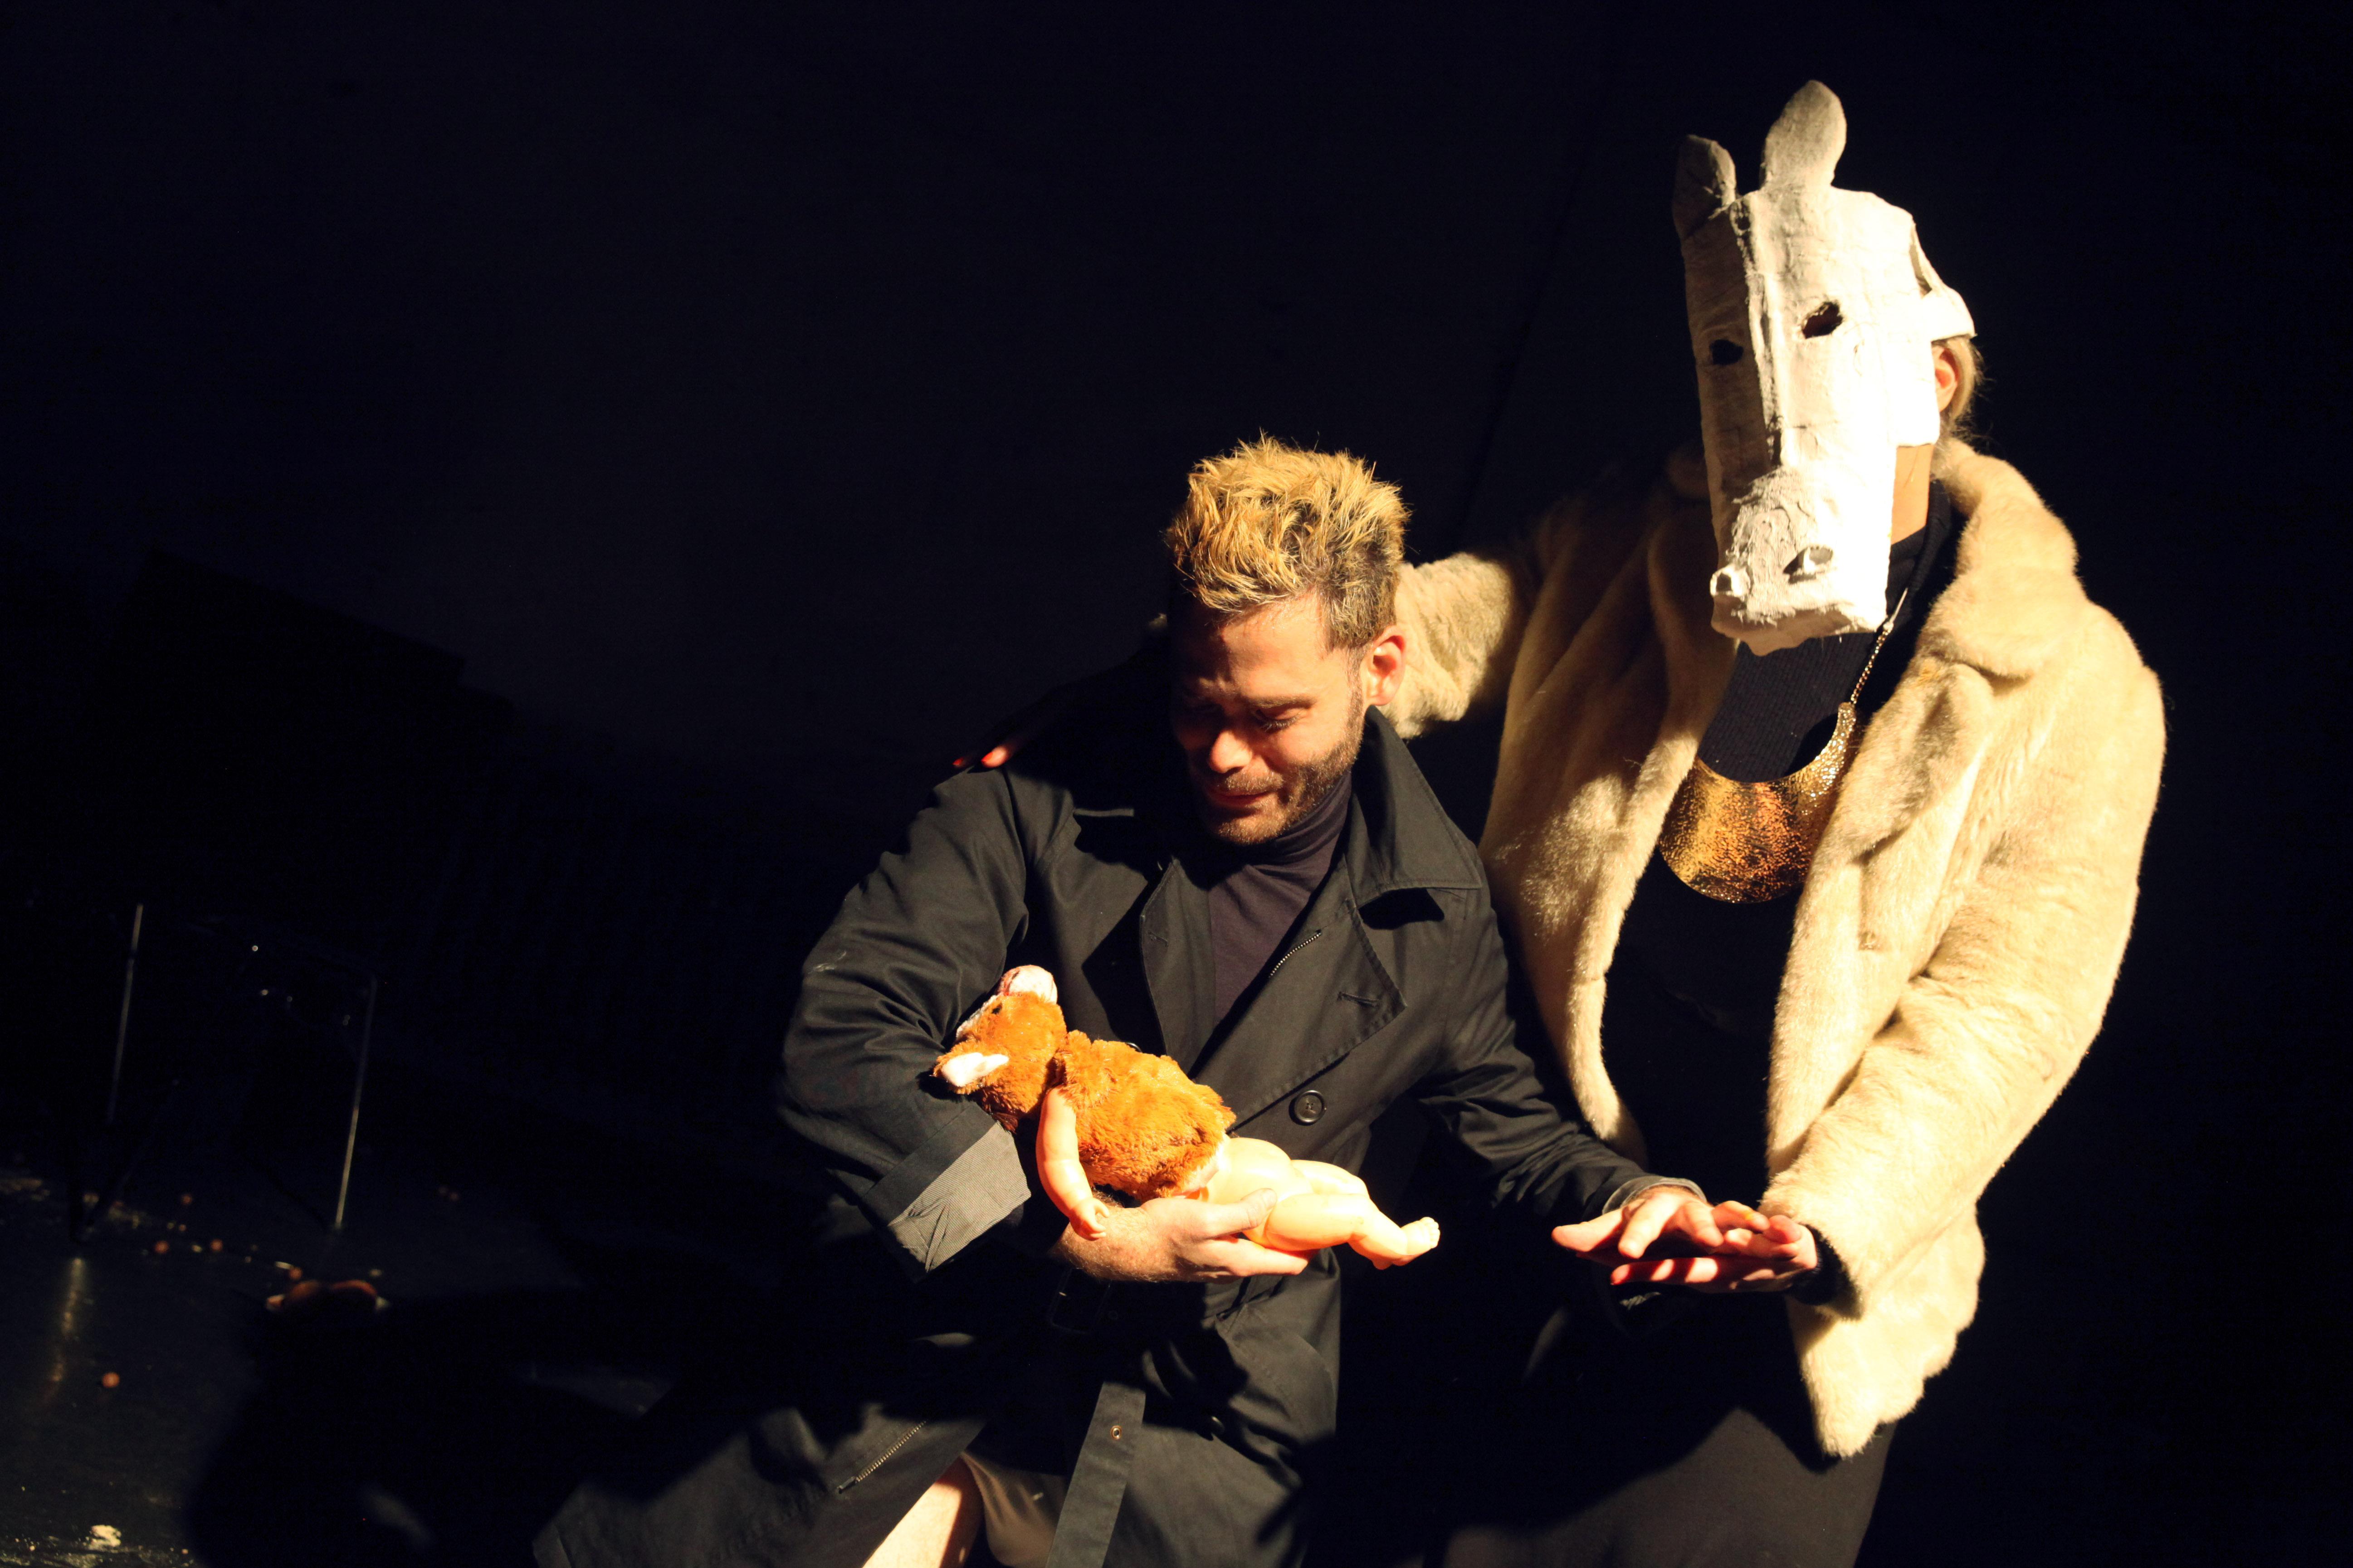 Dirty Debüt S1#3-Snickers | Snickers. An American Tragic-Legend About One Dark Horse and His Australian Venture in an Era of Globalisation by Gur Piepskowitz / Lara Buffard |Photo © Dorothea Tuch